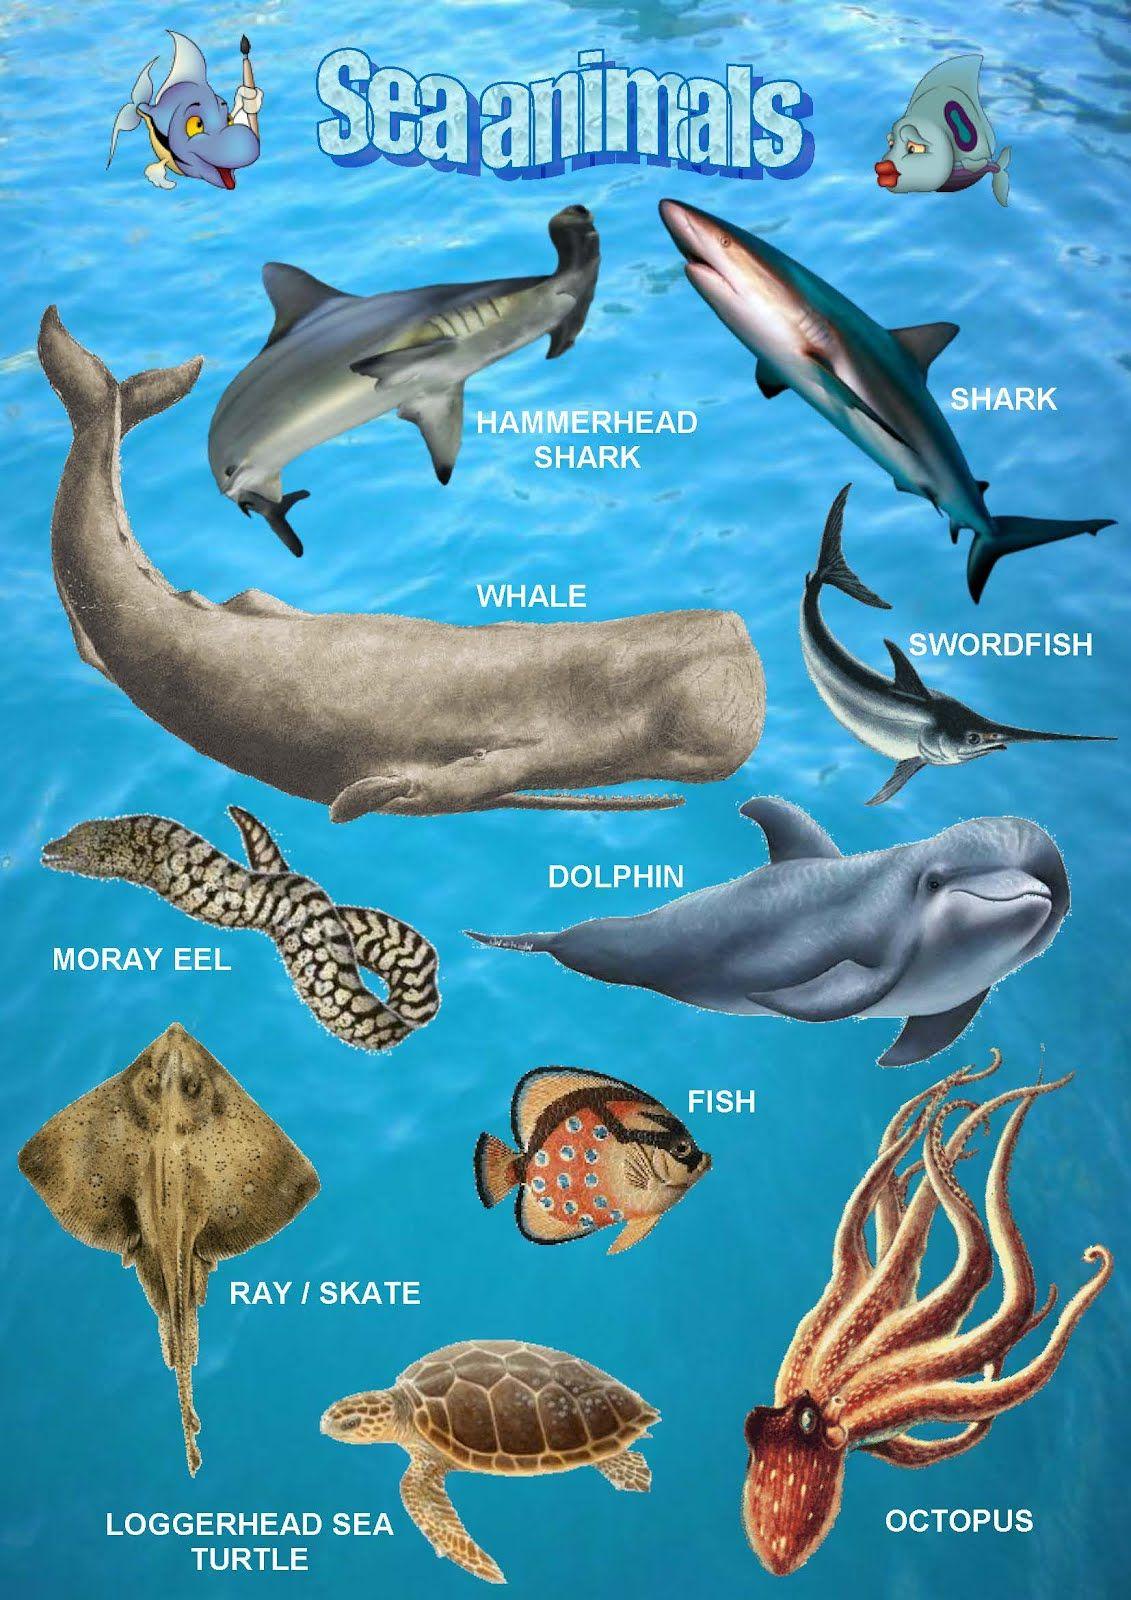 Sea Animals Poster 1